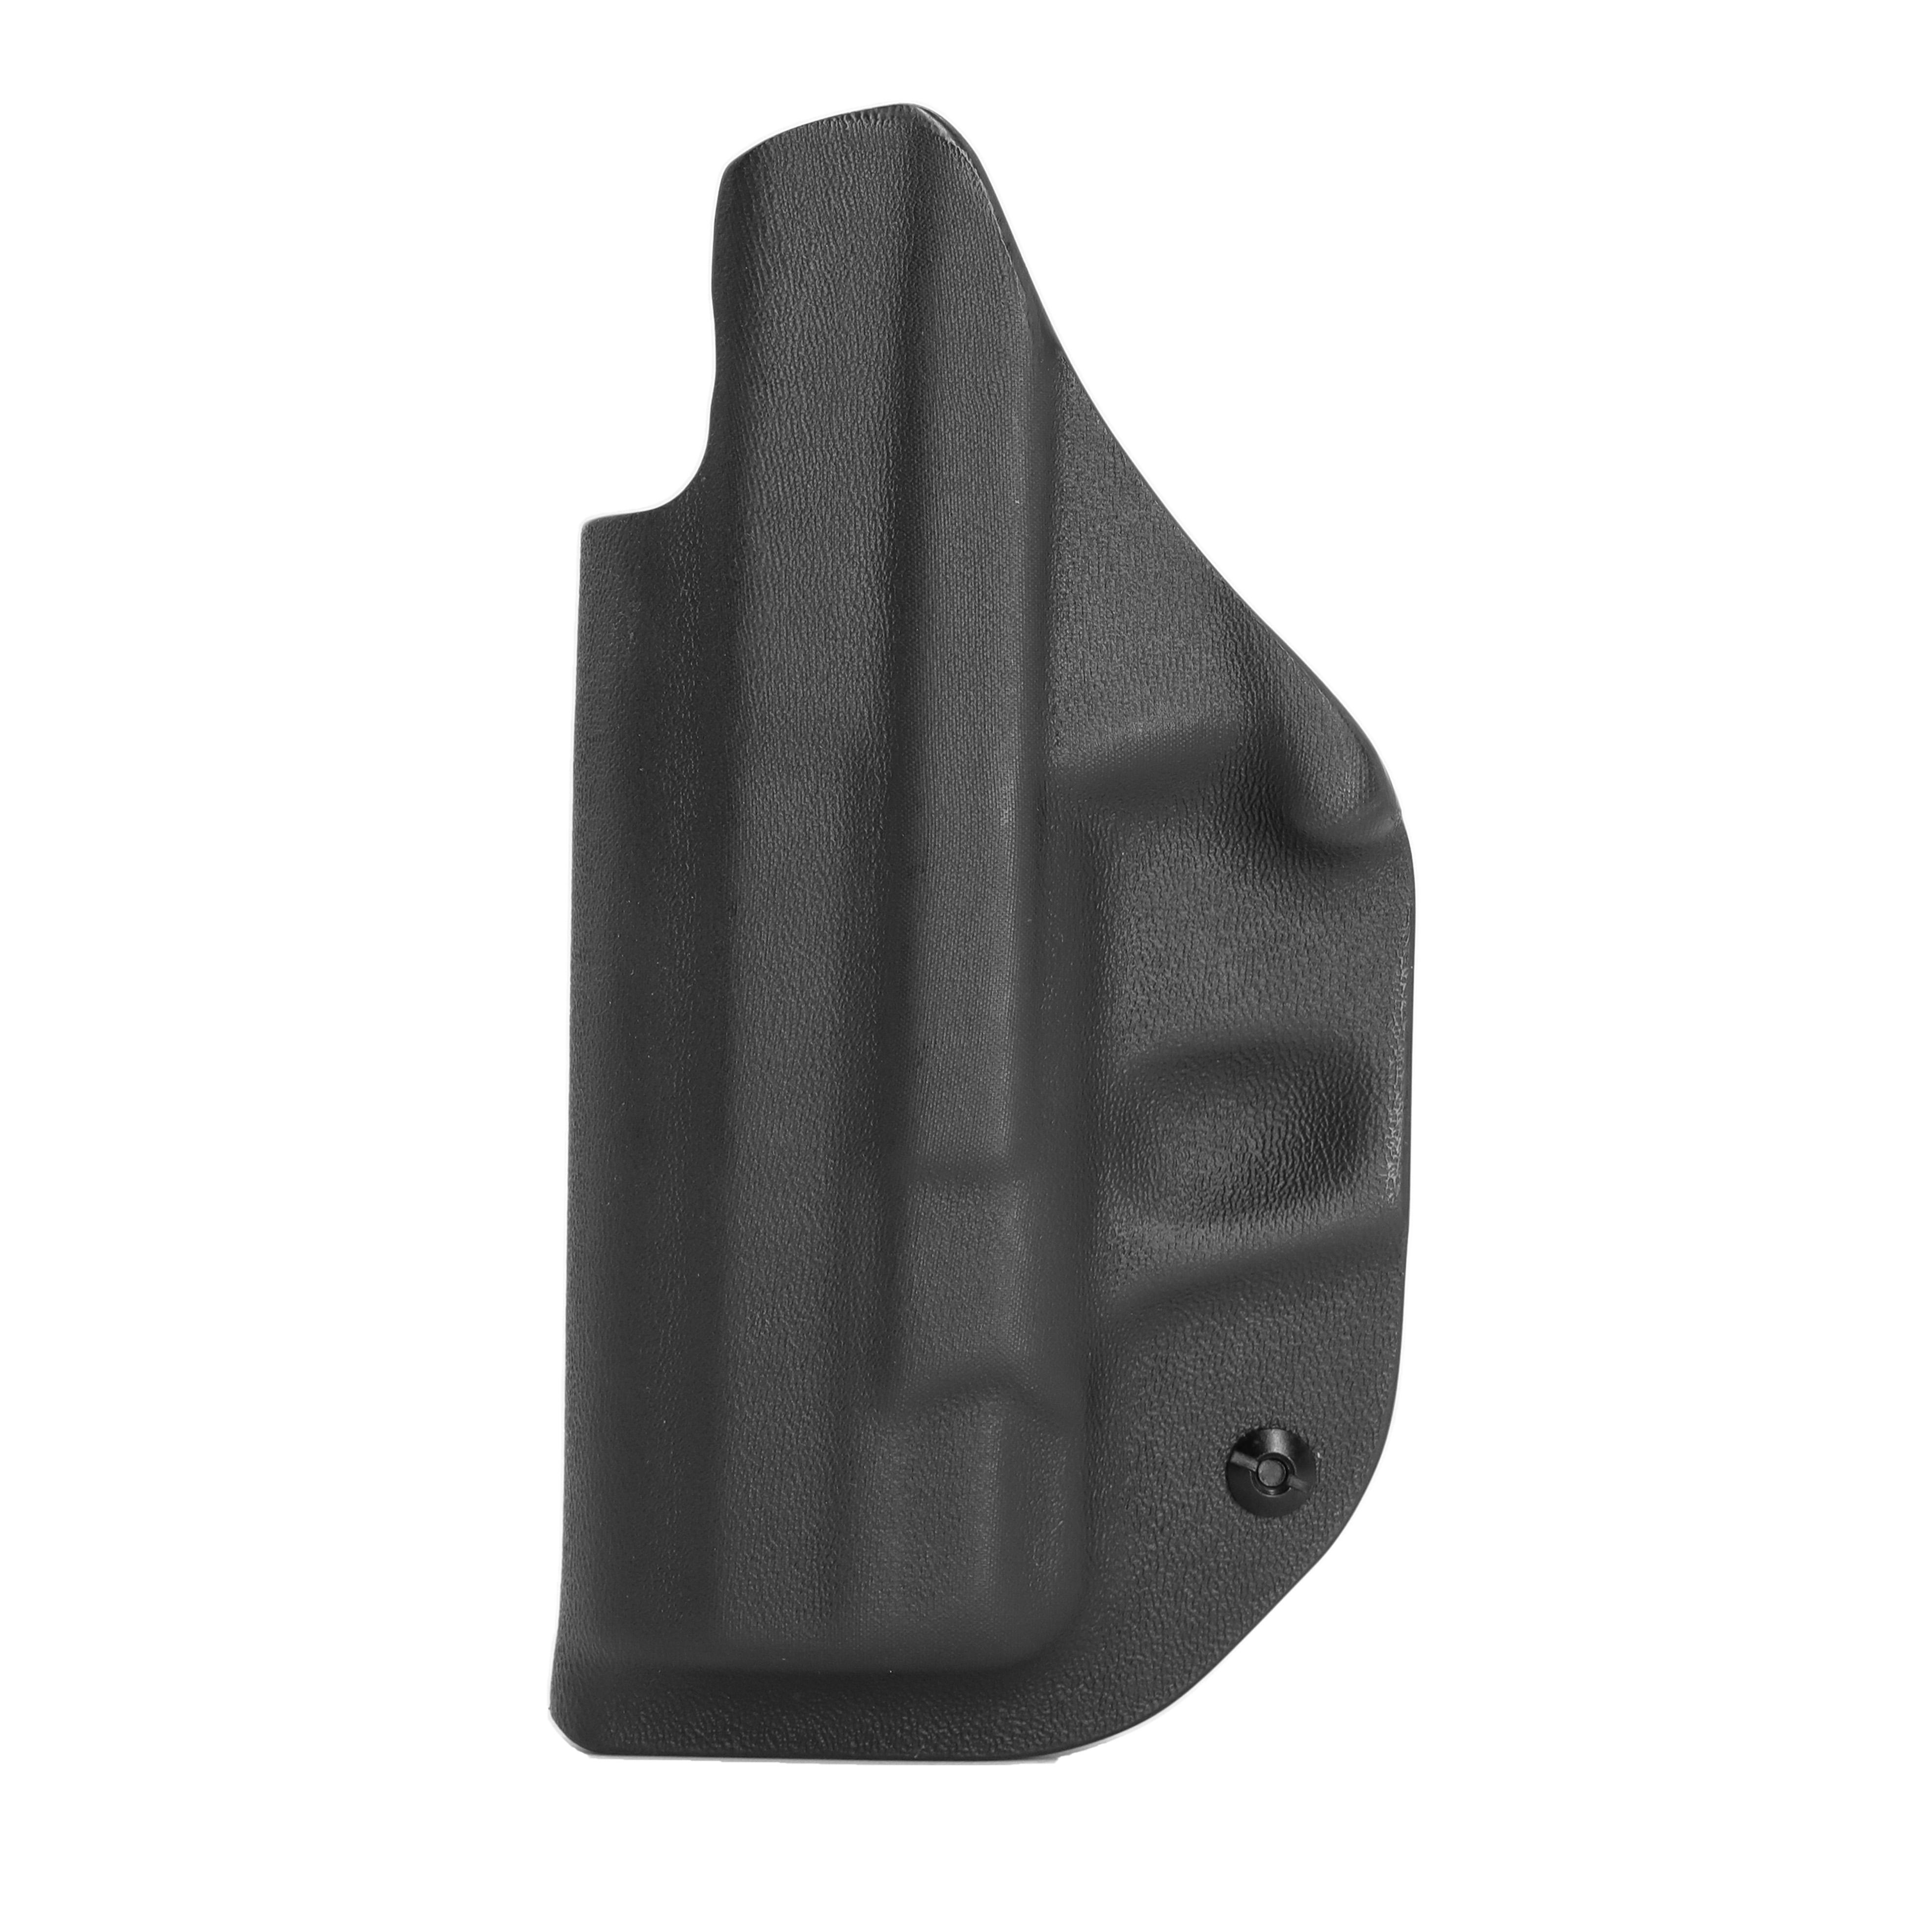 Кобура для пистолета TEGE IWB Kydex Smith & Wesson M & P, скрытая сумка для пистолета уровня 1 для охоты на открытом воздухе